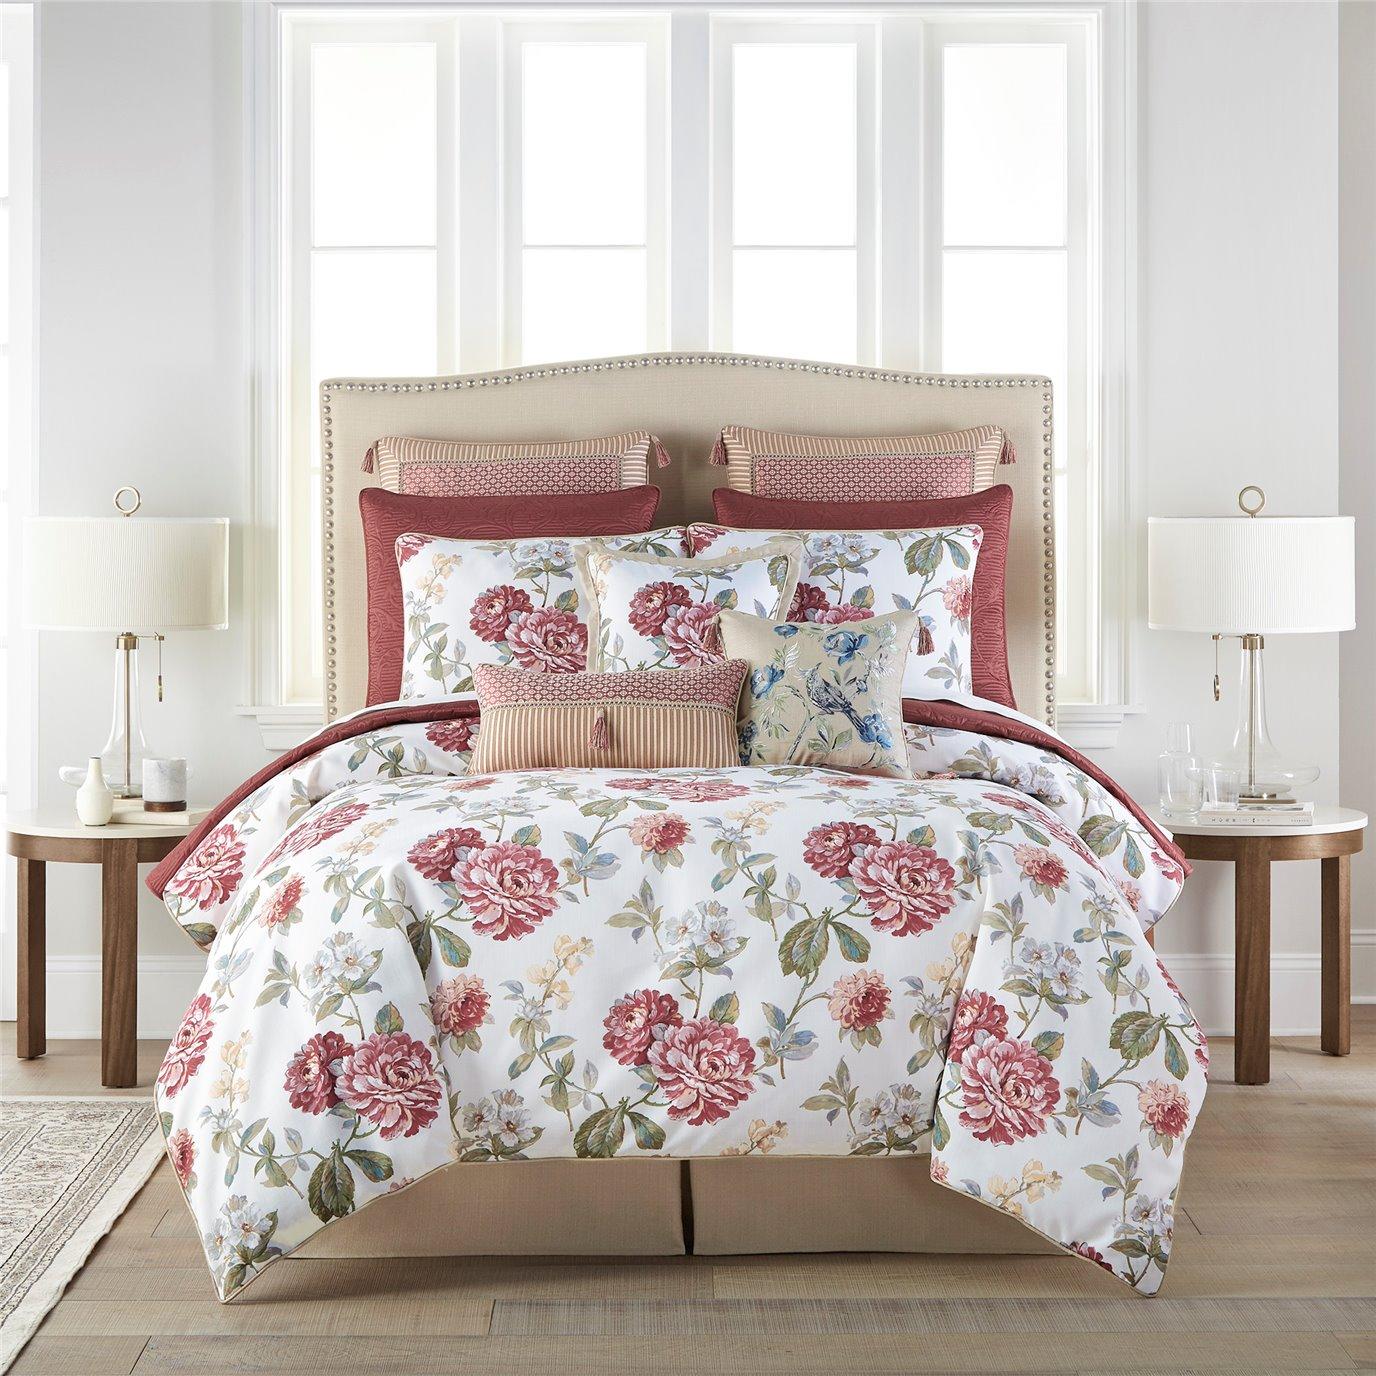 Croscill Fleur King 4PC Comforter Set